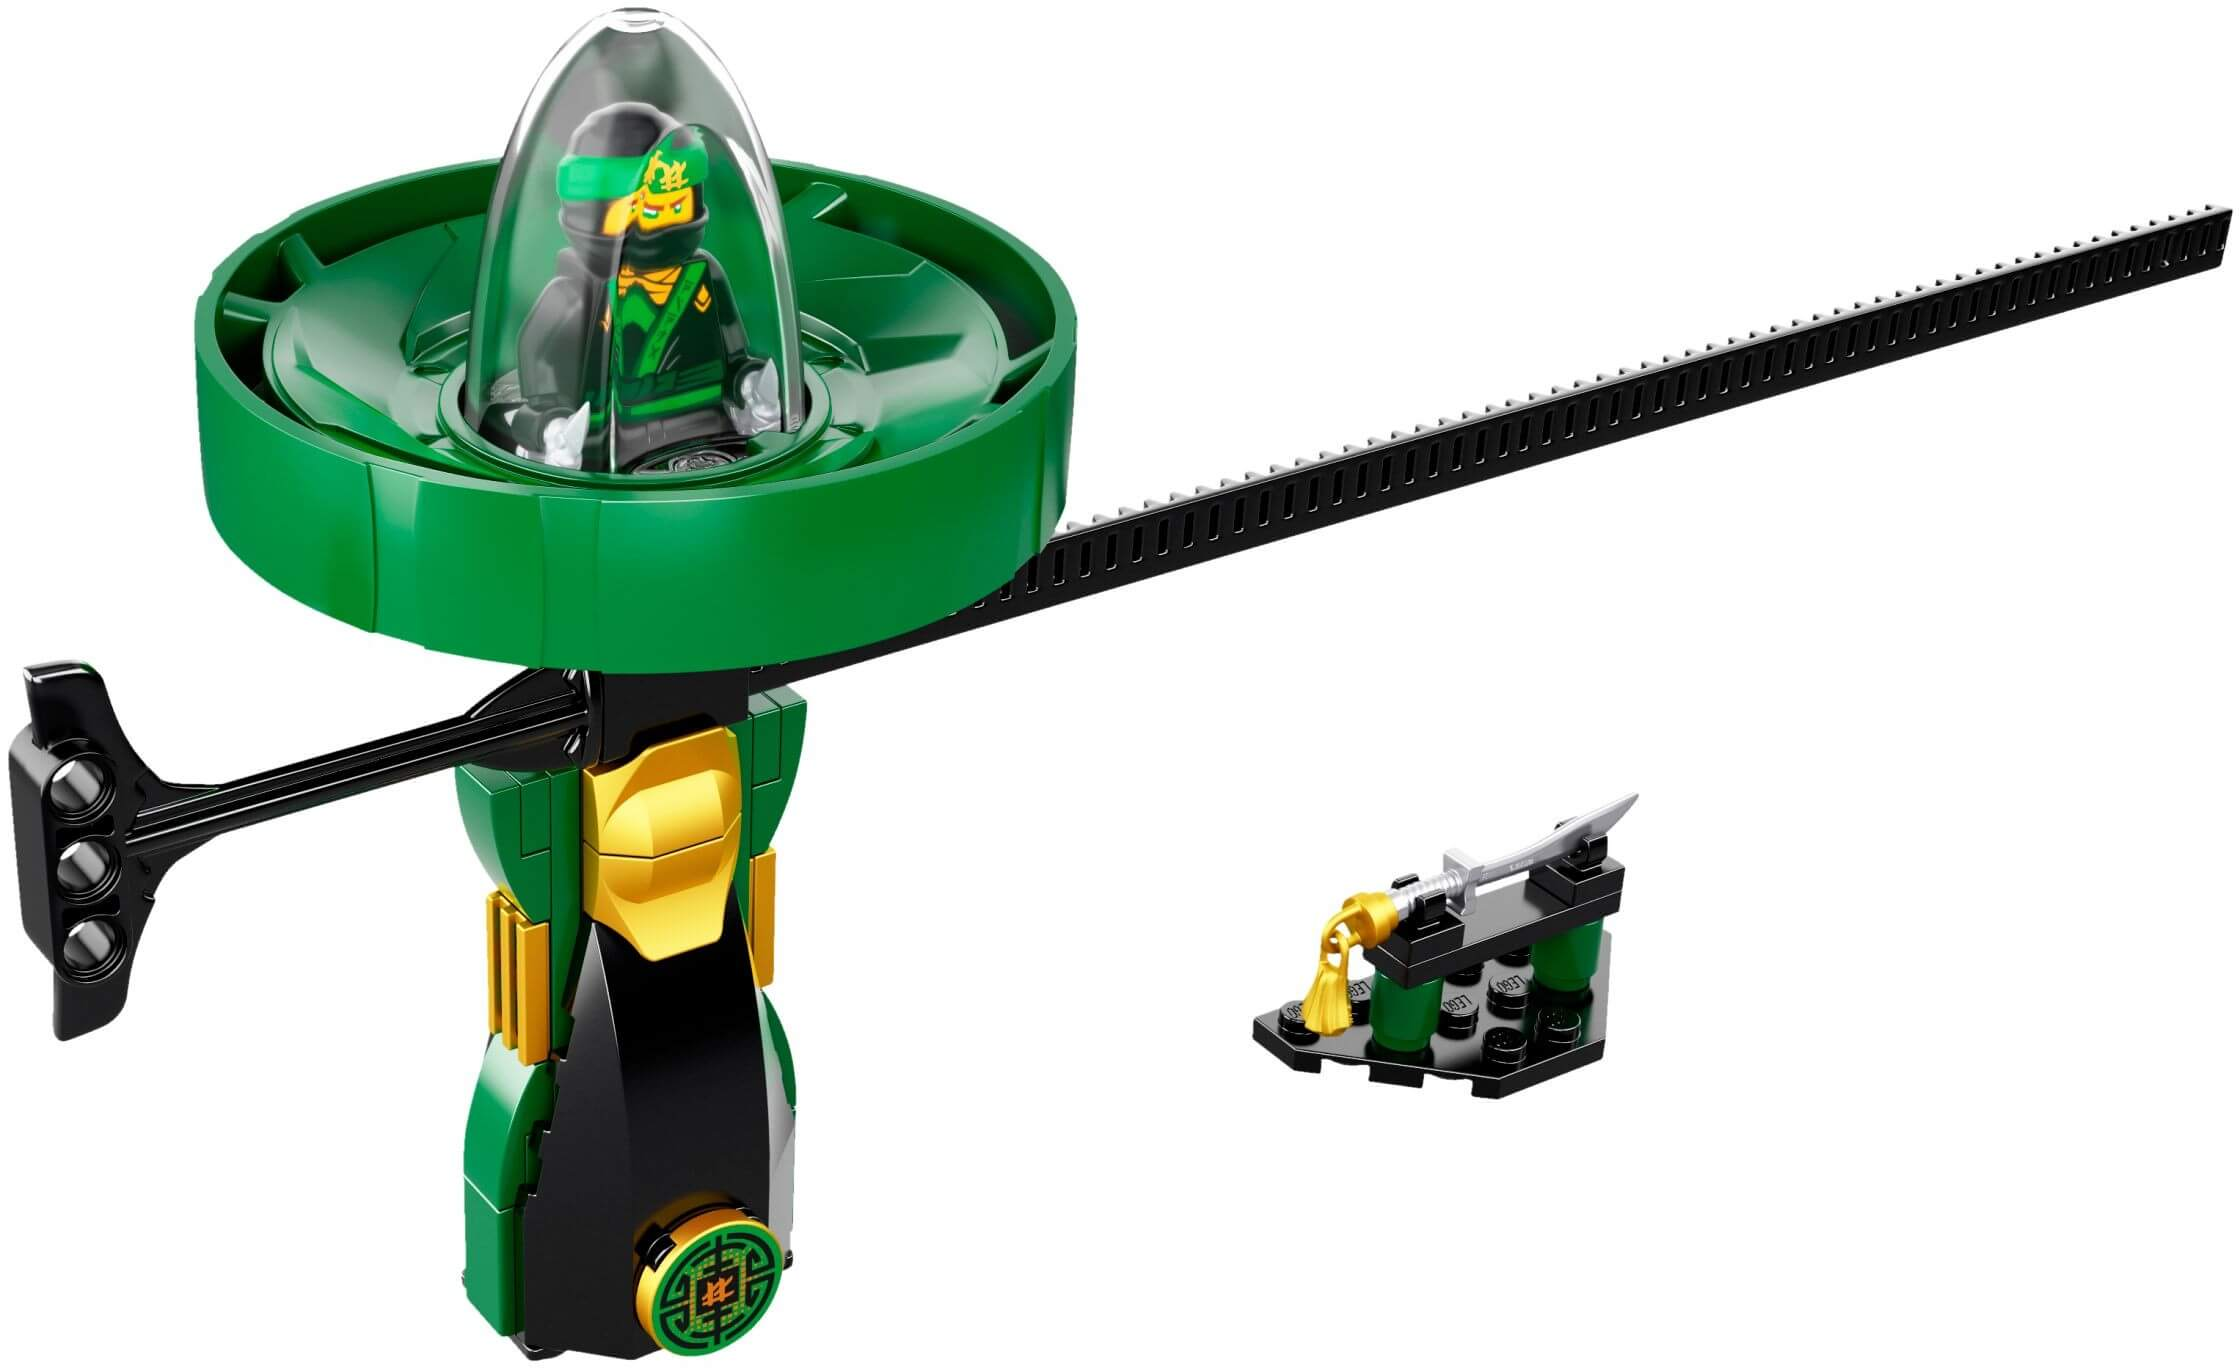 Mua đồ chơi LEGO 70628 - LEGO Ninjago 70628 - Lốc Xoáy Bay của Lloyd - Spinjitzu Master (LEGO Ninjago 70628 Lloyd - Spinjitzu Master)